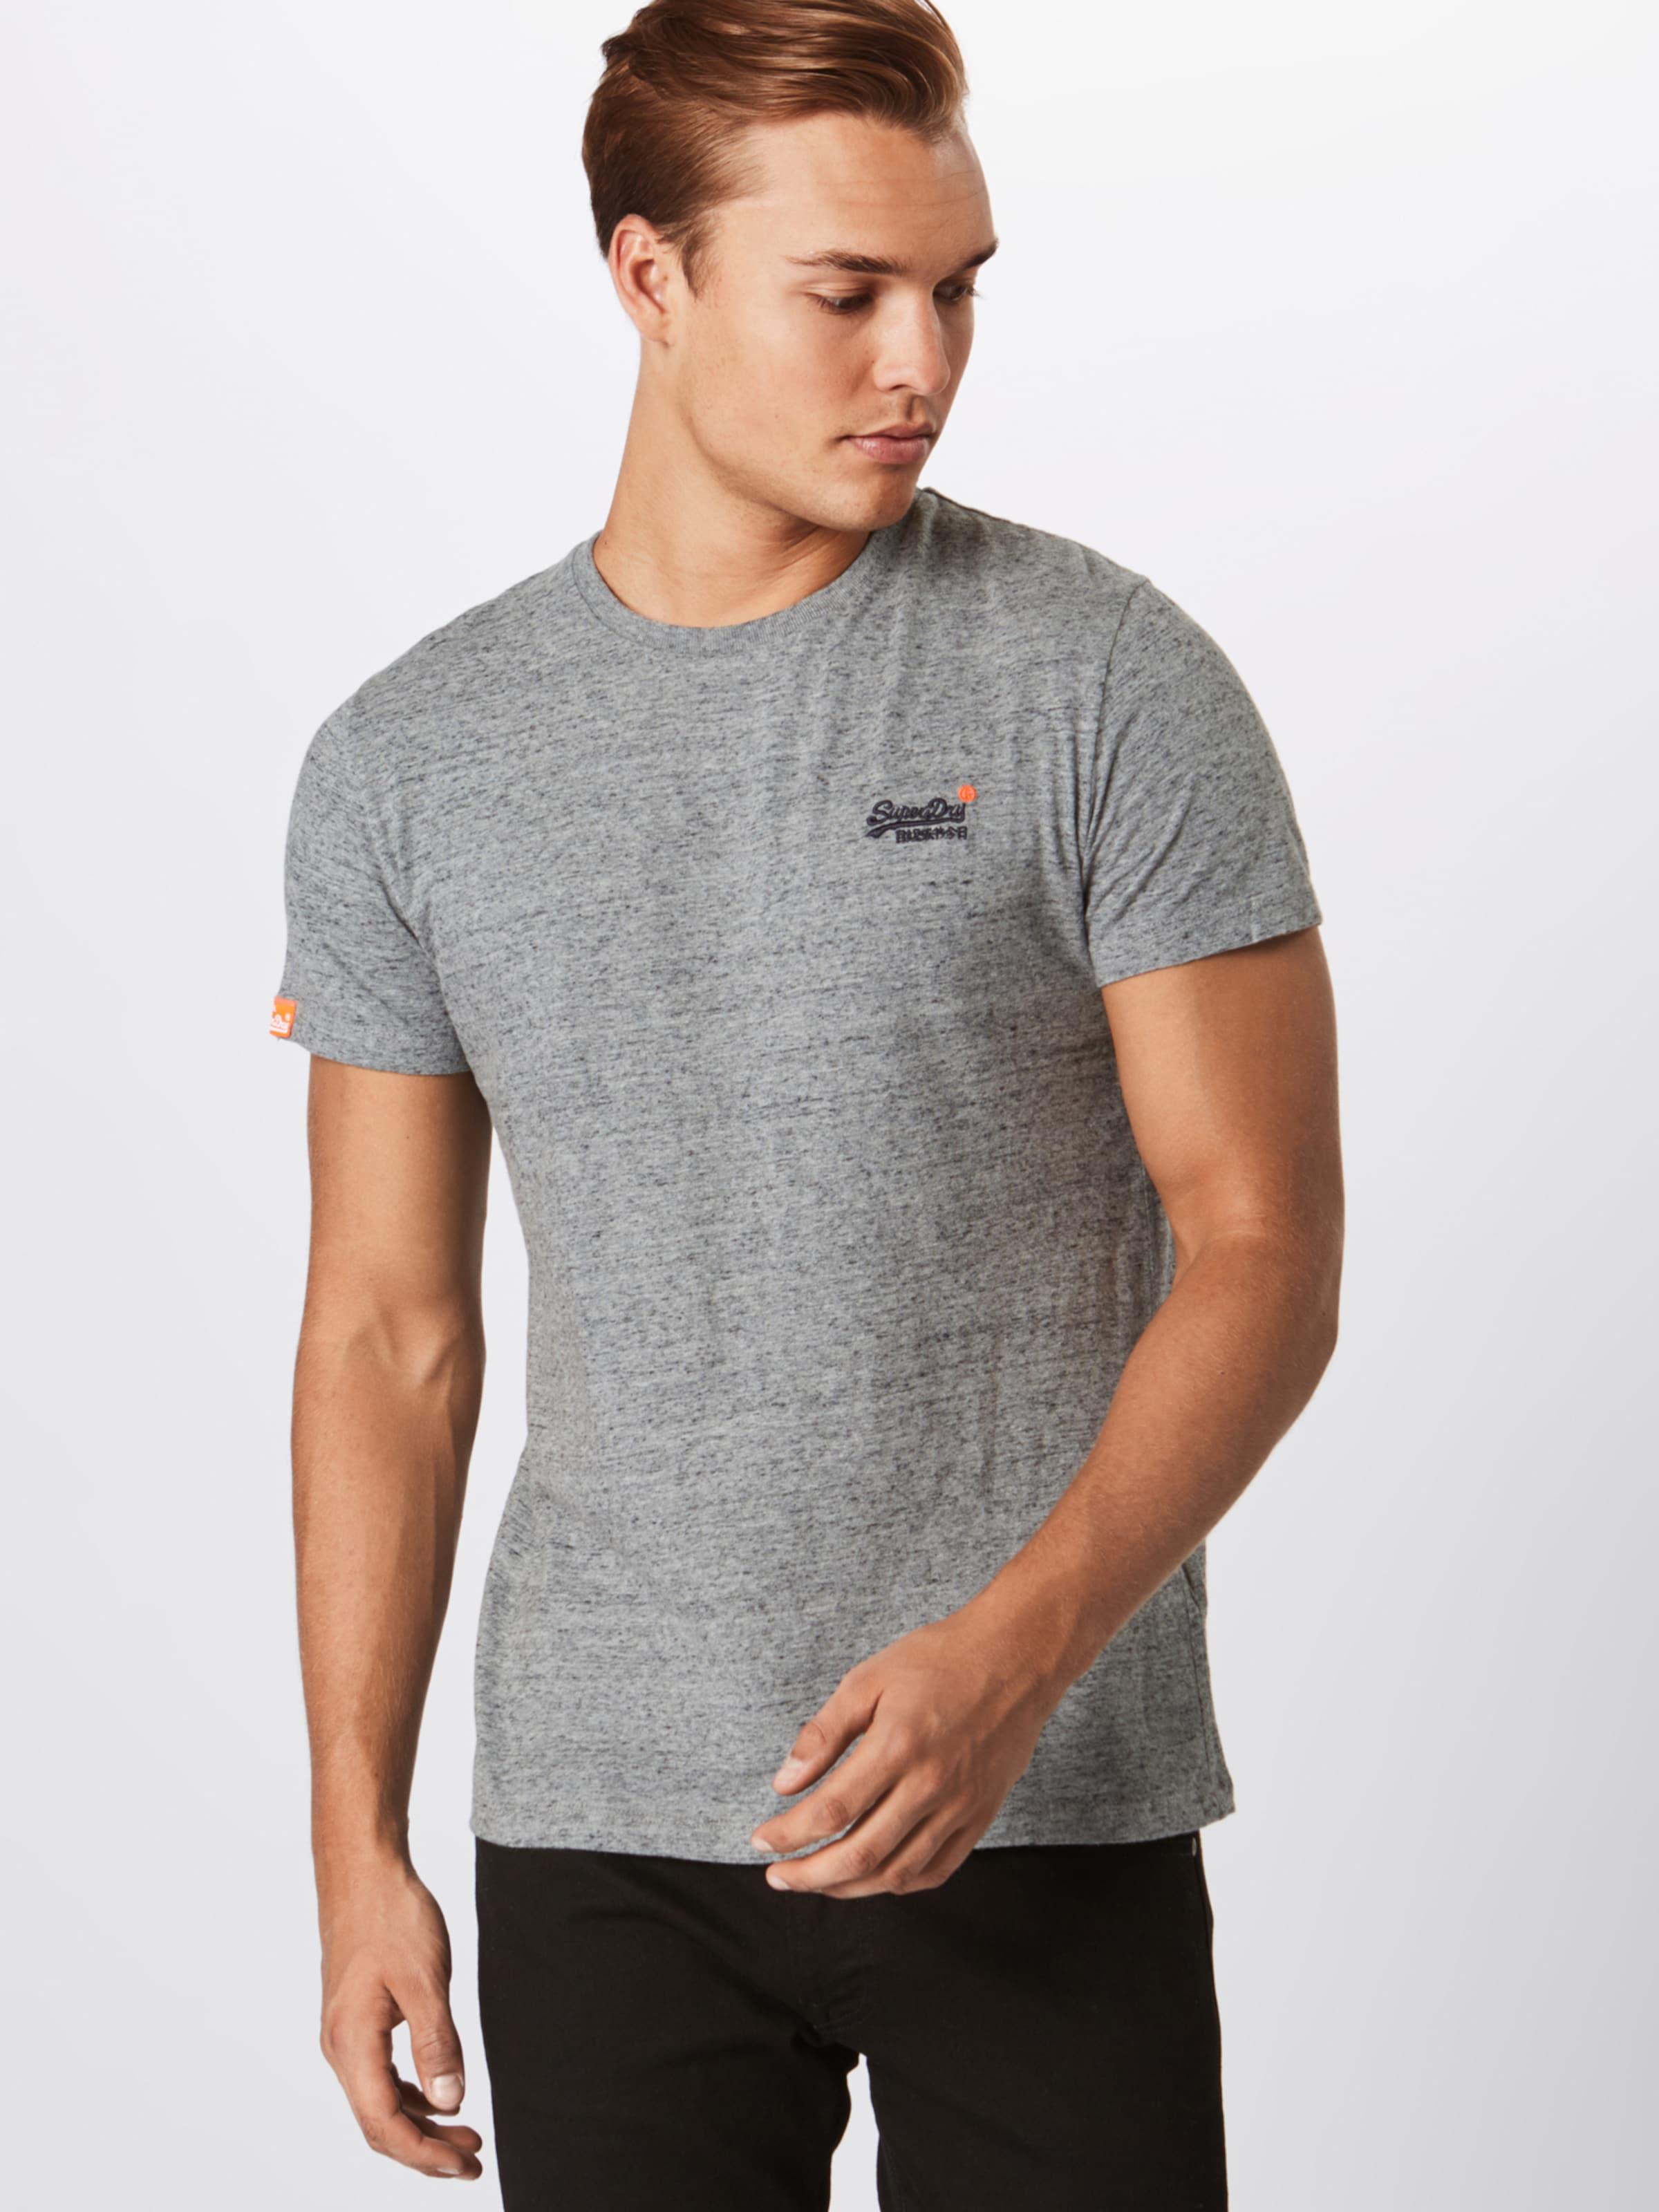 'orange Superdry Label' T In Graumeliert shirt EH9D2YbeWI